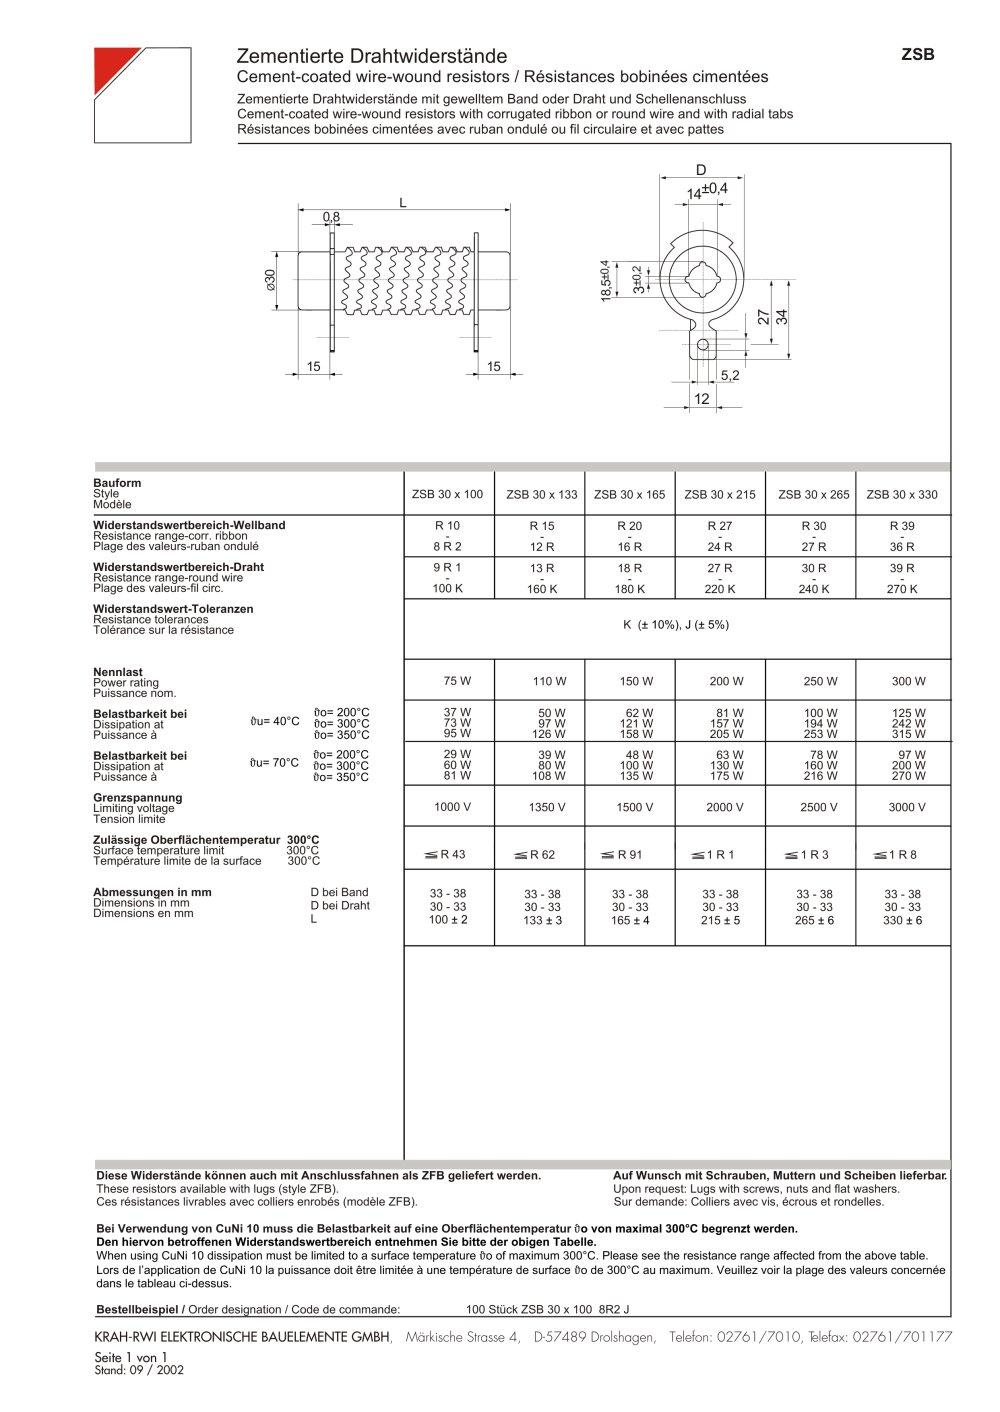 Cement-coated wire wound resistors ZSB - Krah Group - PDF Catalogue ...